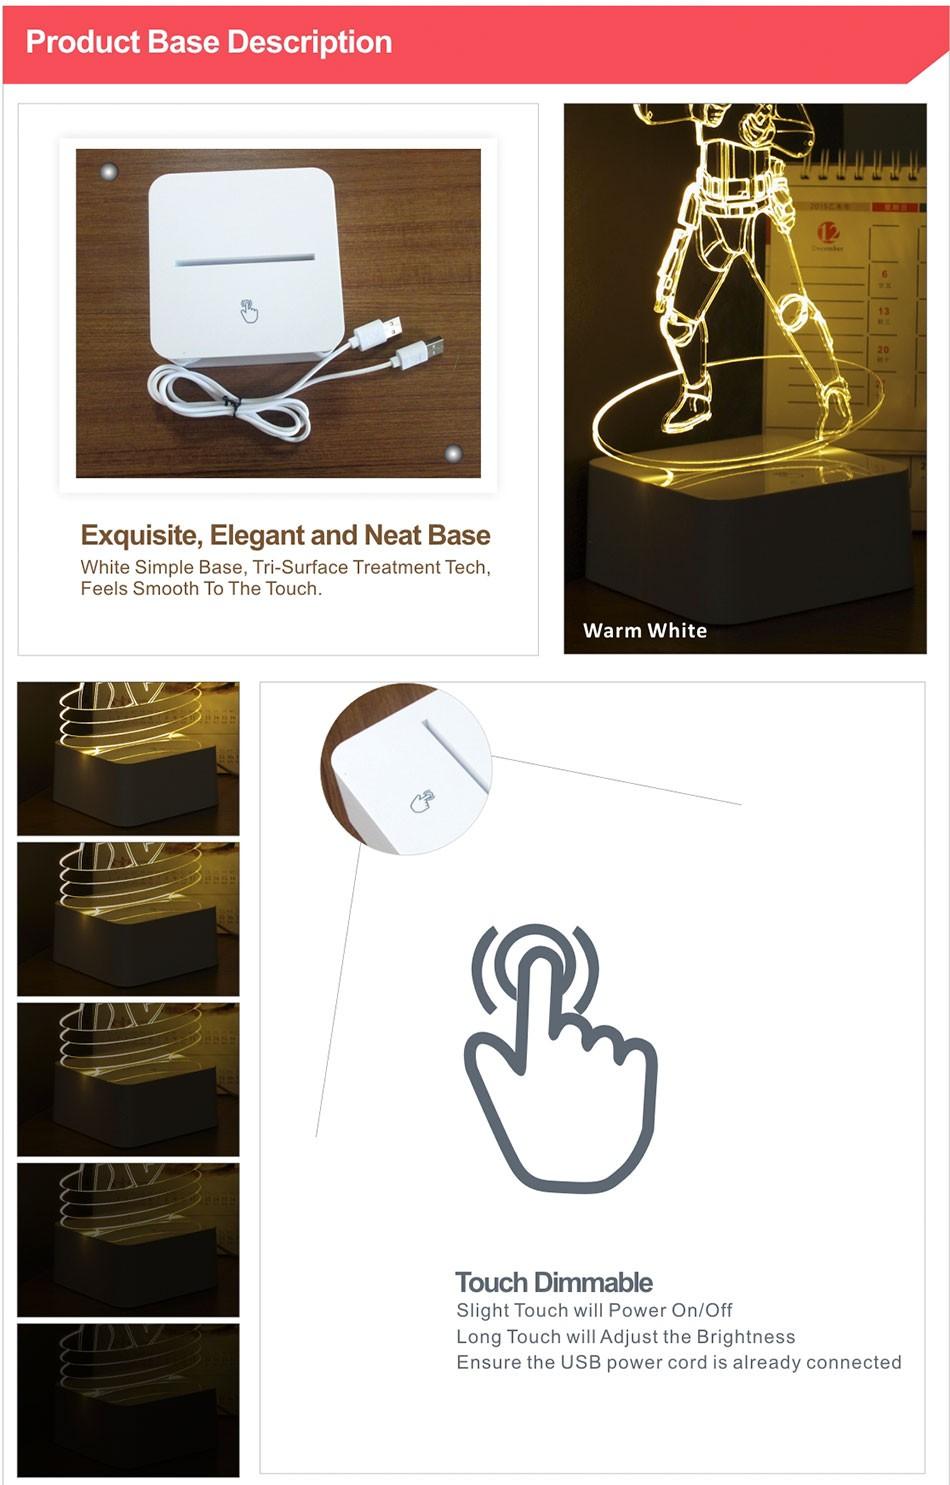 Luz de Noche Led for Star War Fans Imperial Stormtrooper 3D Lamp as Home Decor Bedroom USB Nightlight  (8)